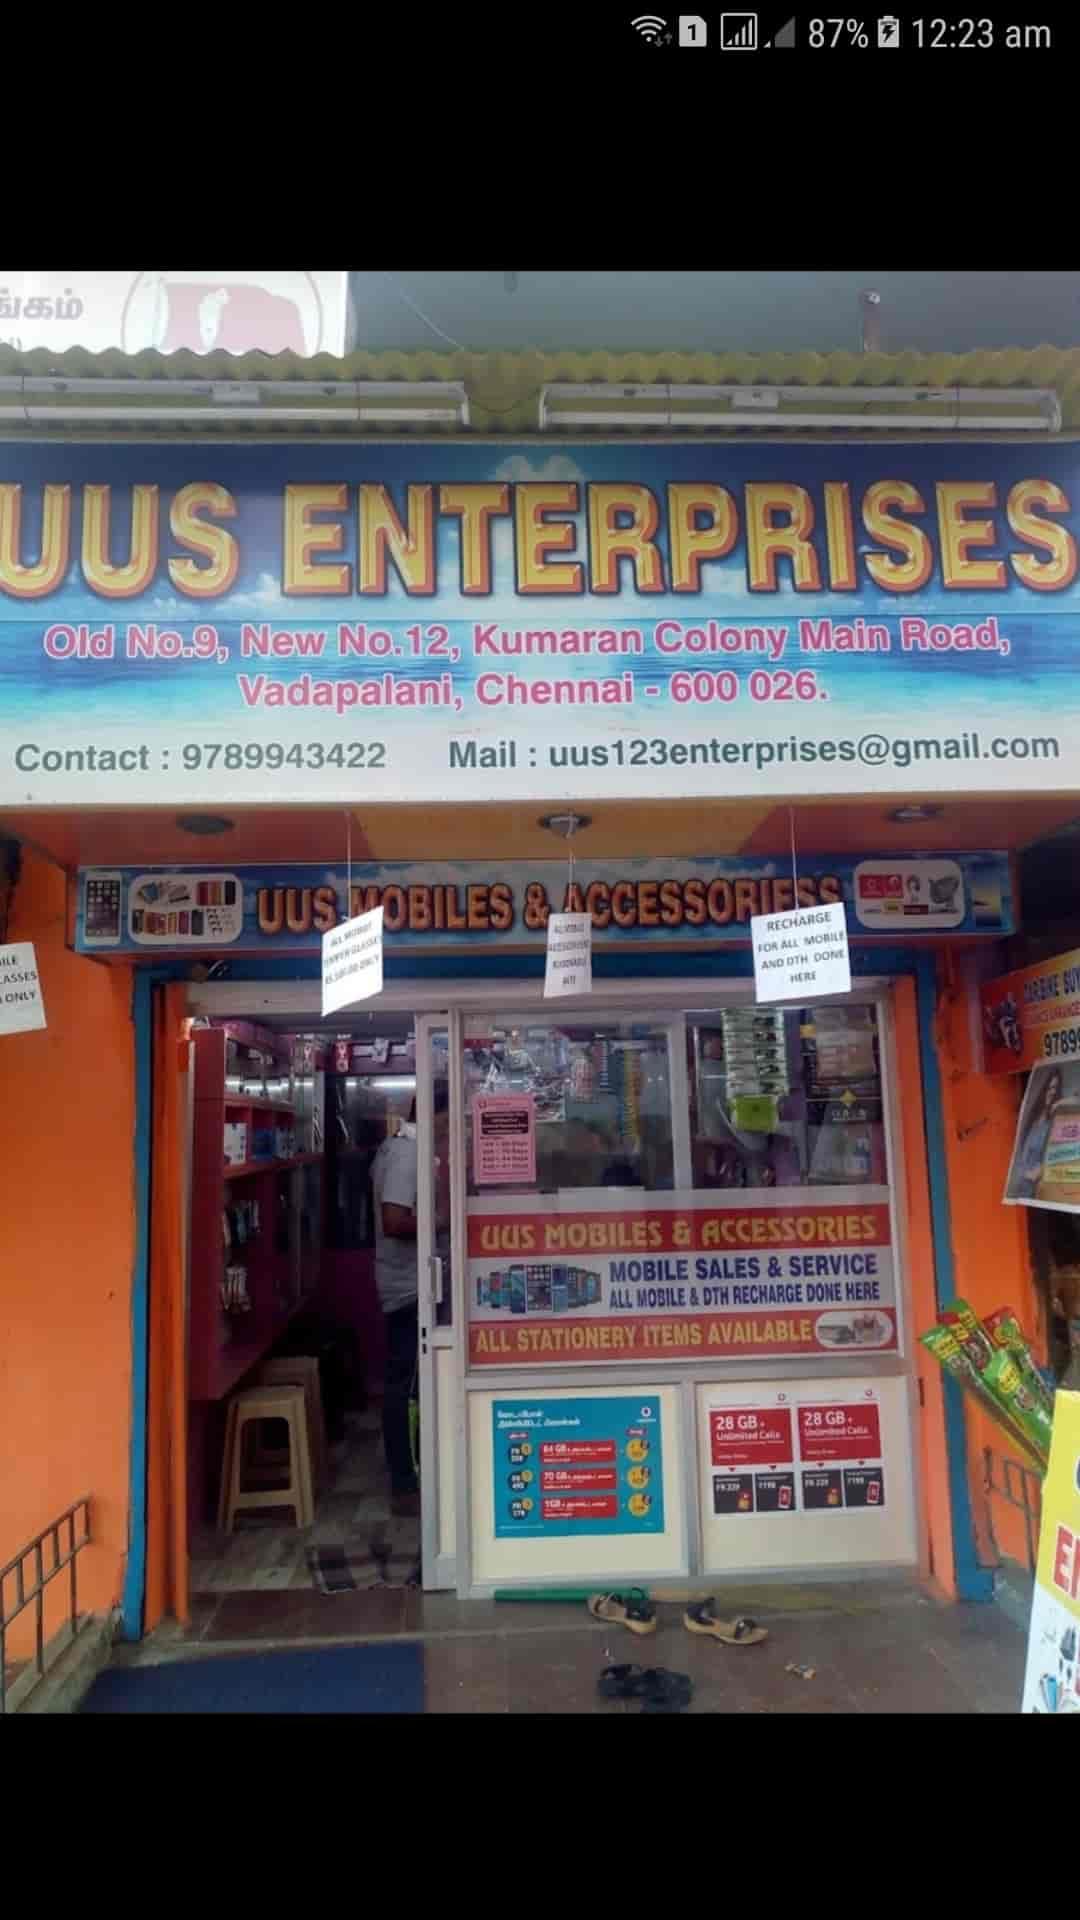 Uus Enterprises, Vadapalani - Mobile Phone Repair & Services